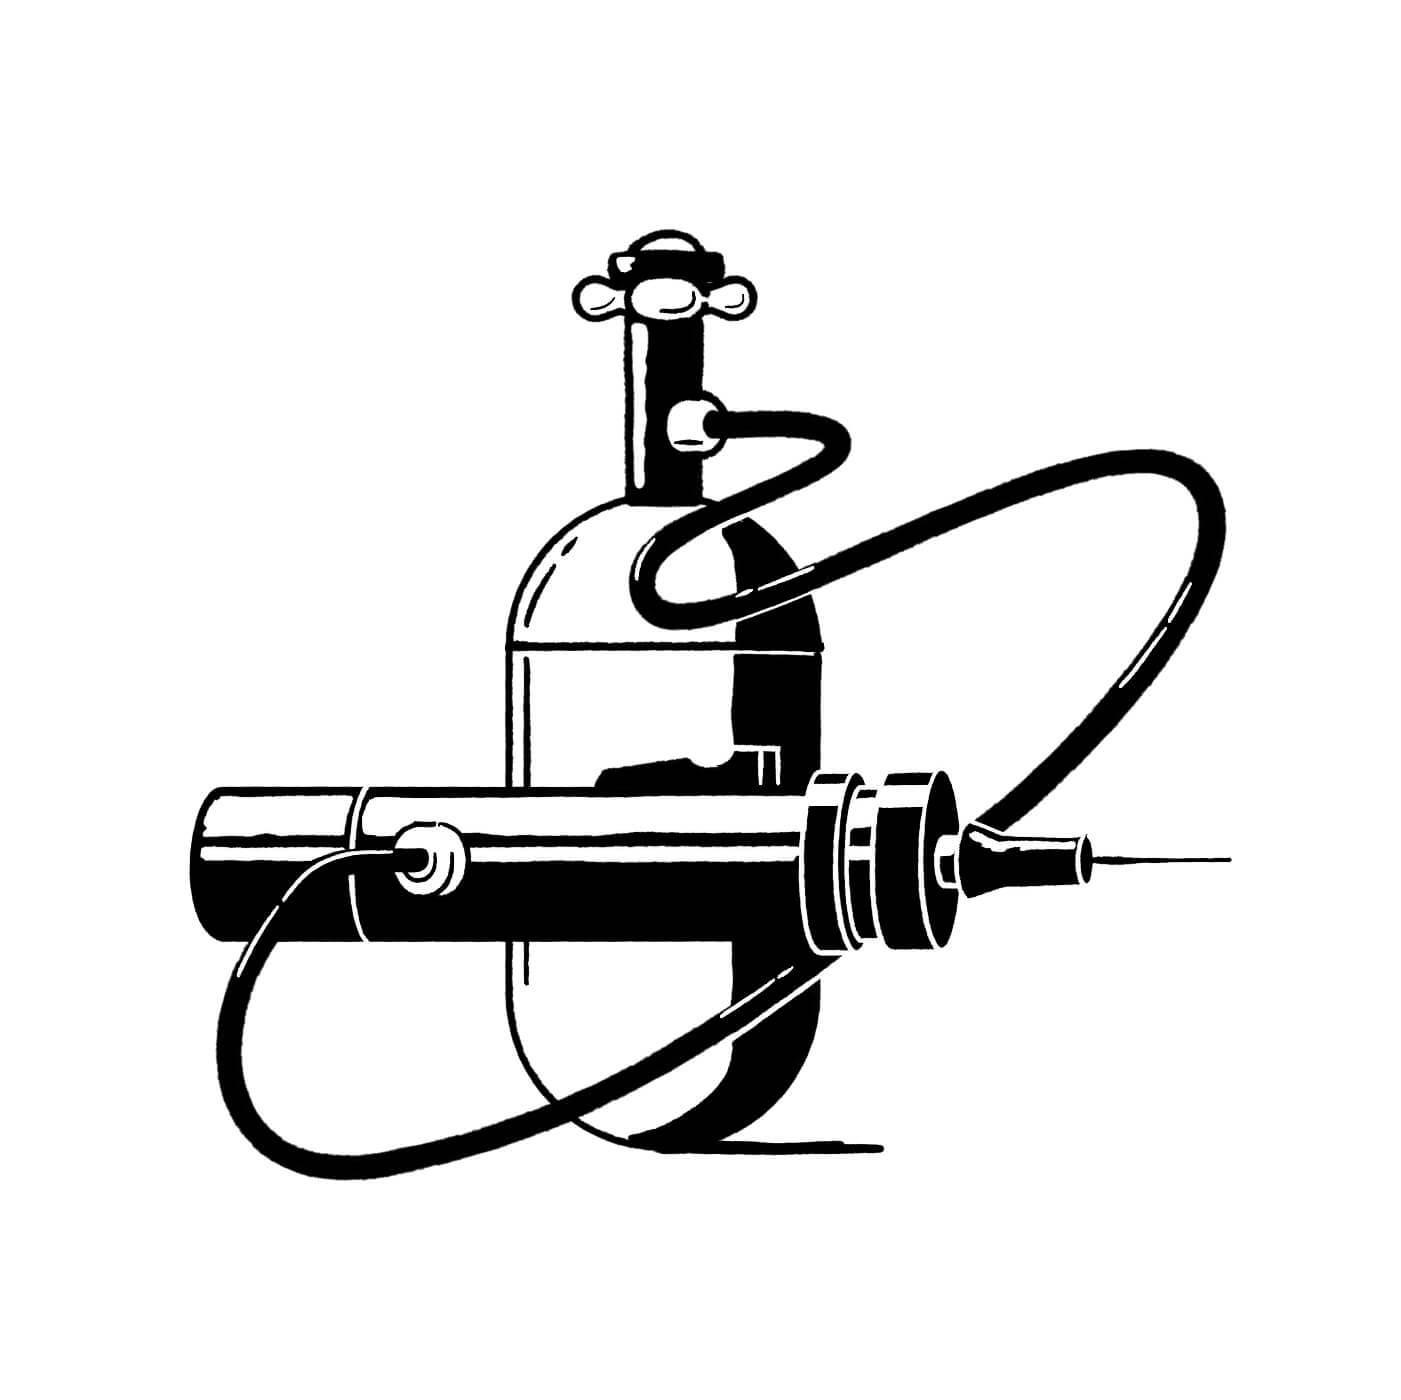 Kohlendioxid-Injektionstherapie Berlin bei TEMEDOS Hausarzt Berlin